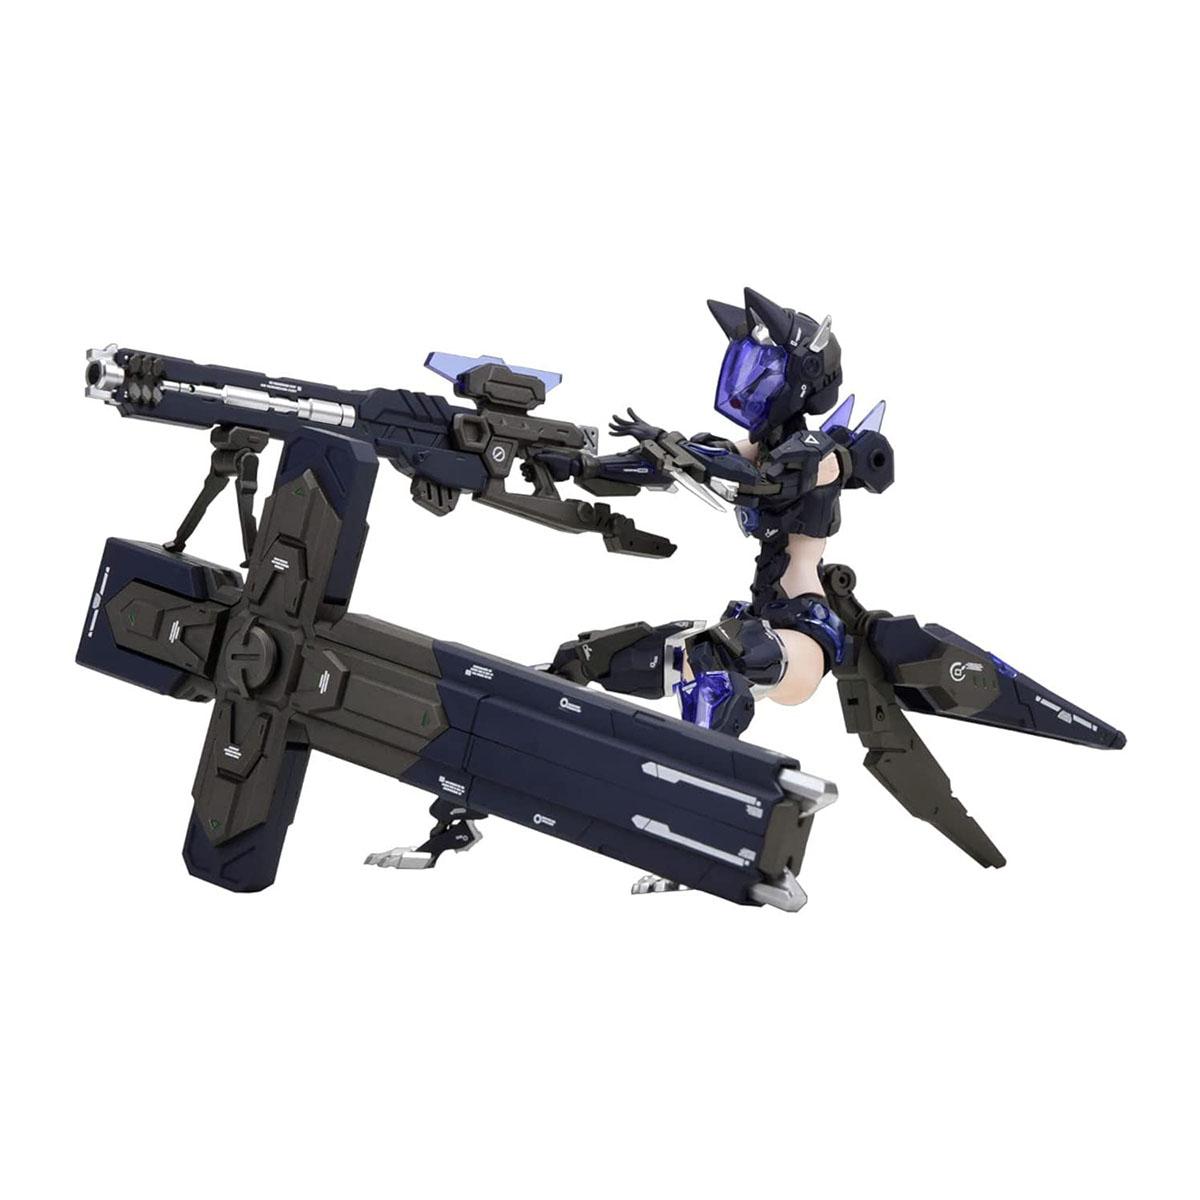 FANTASY GIRLS『F.O.X Long Range Striker Unit』1/12 プラモデル-007